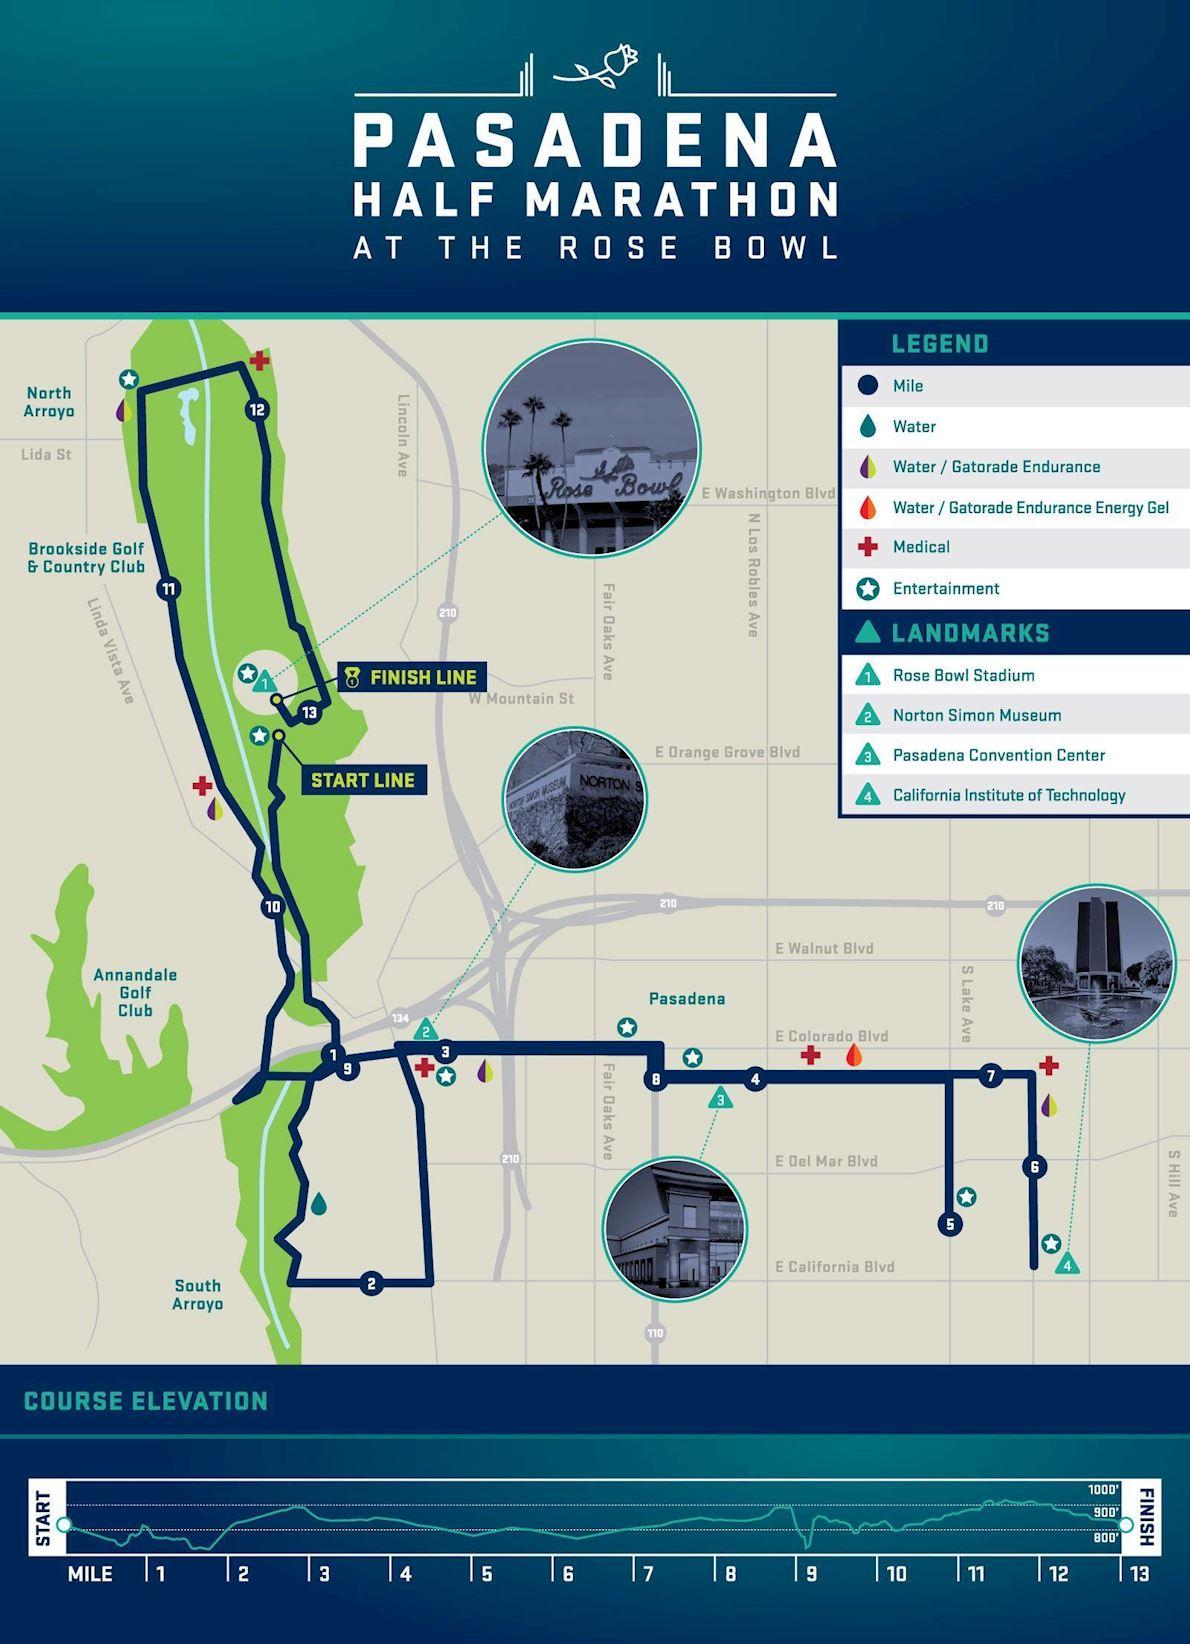 Pasadena Rose Bowl Half Marathon Routenkarte